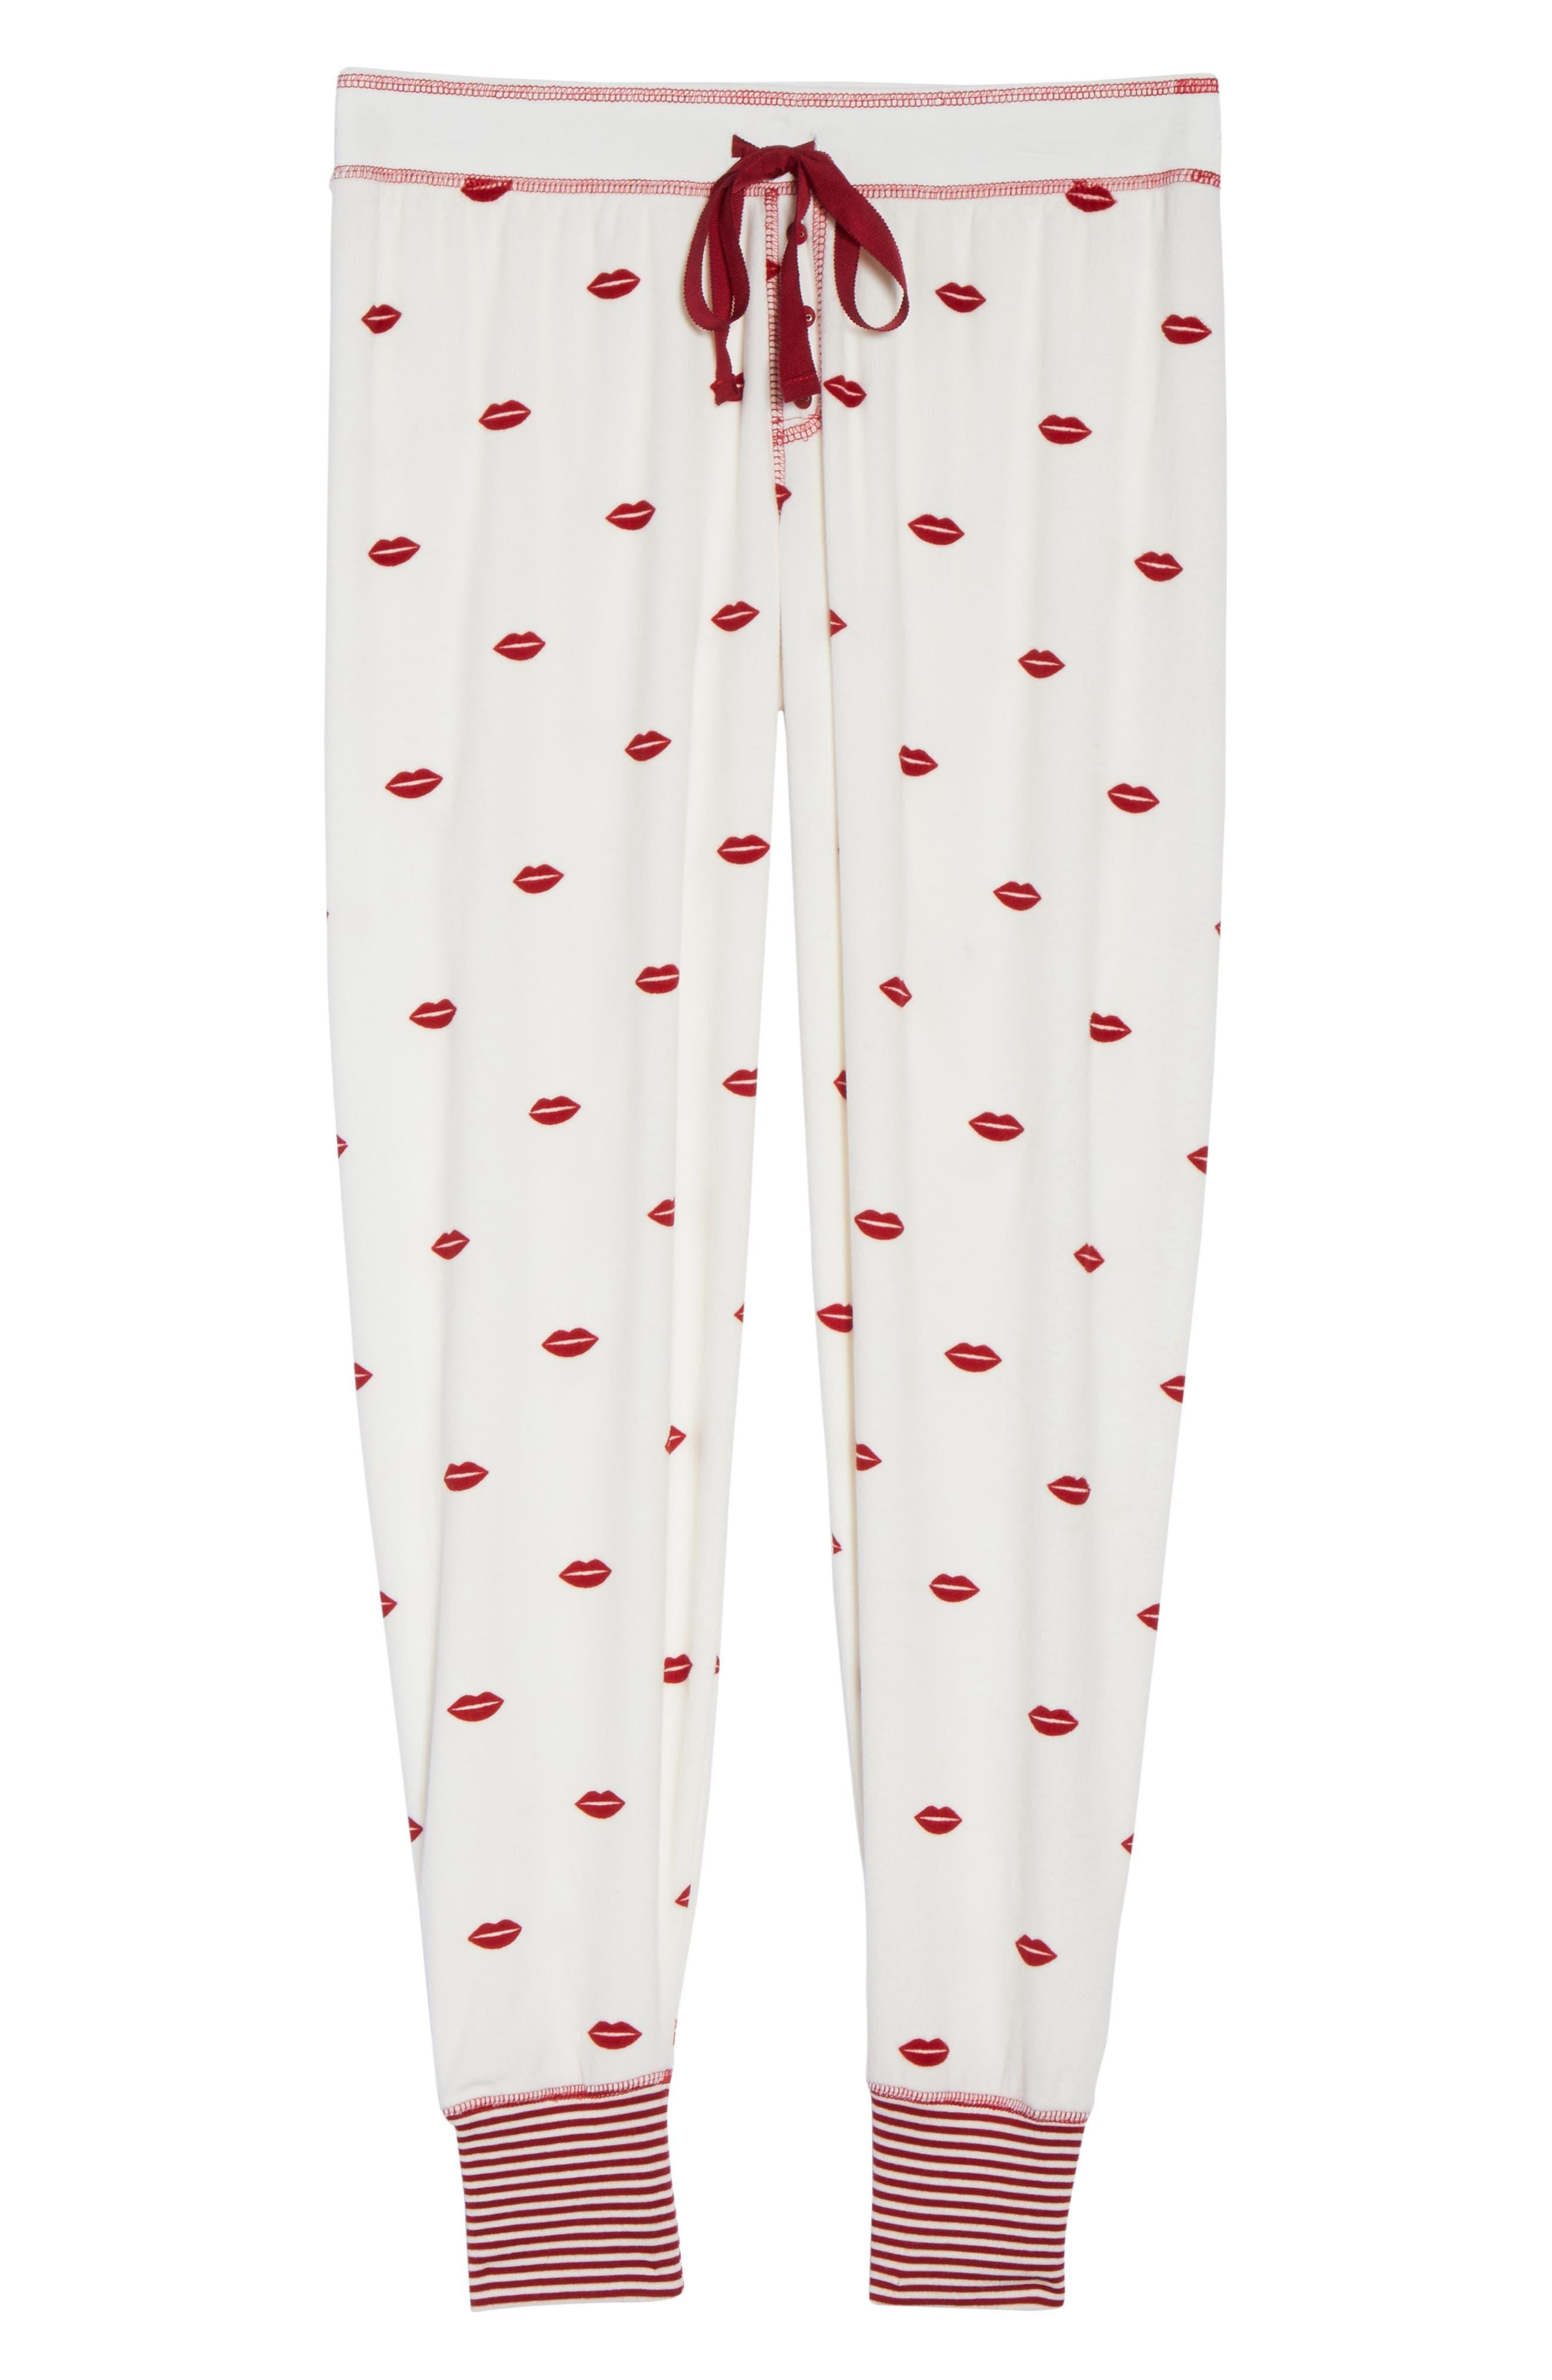 PJ SALVAGE, Lip Print Pajama Pants, Alternate thumbnail 6, color, 900